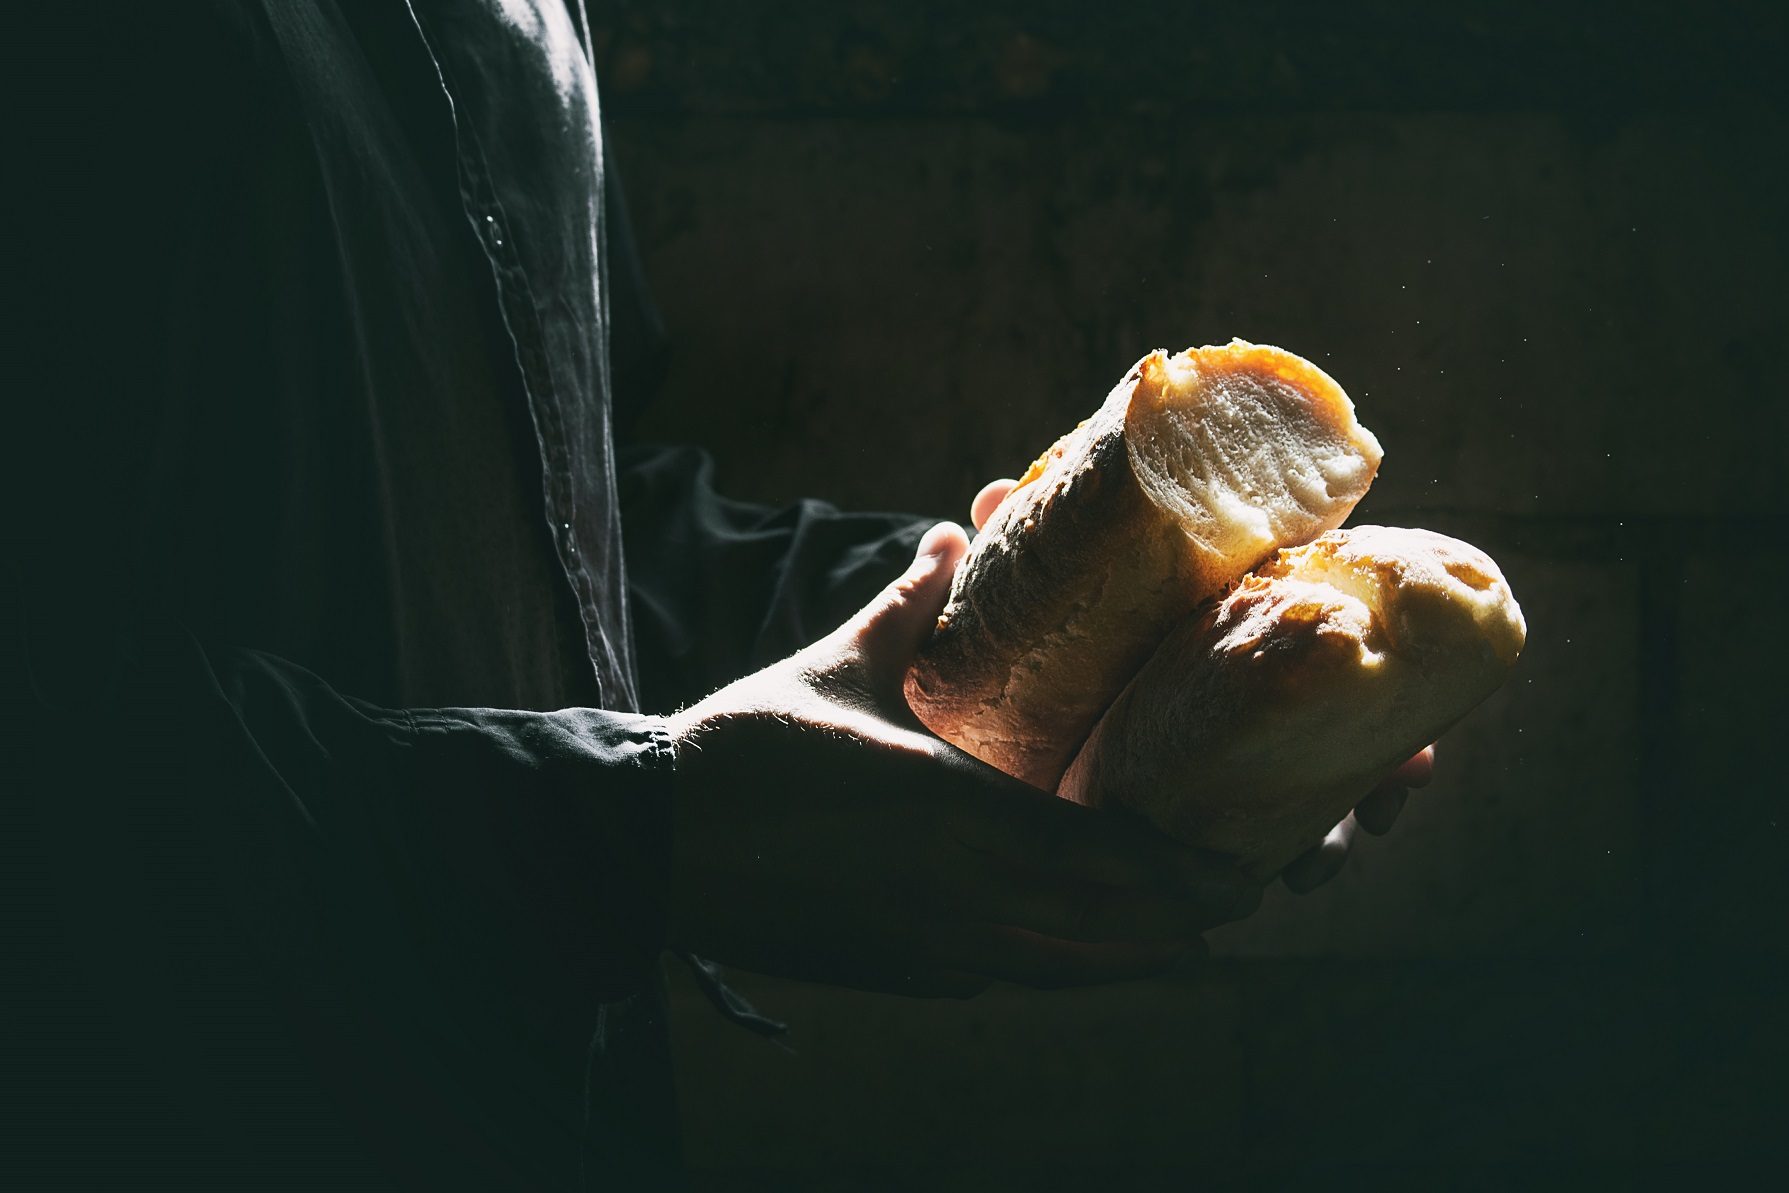 fresh baked bread in hands PSKTW9J #новости бедность, уровень жизни